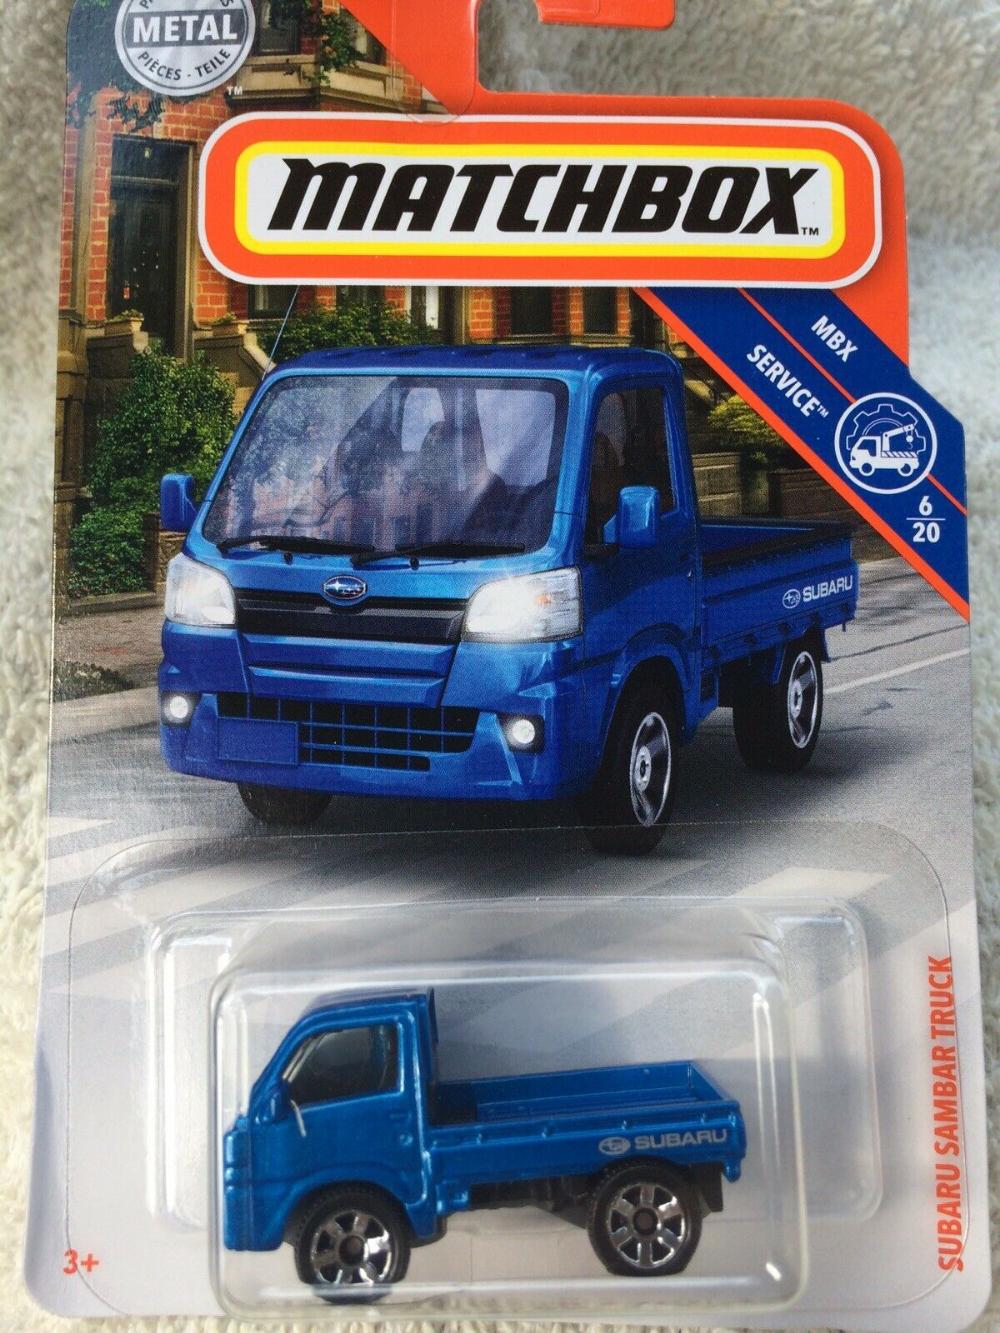 Subaru Pickup 2019 : subaru, pickup, Matchbox, Subaru, Sambar, Truck-#6/20, Service-Free, Shipping!, Subaru,, Matchbox,, Trucks